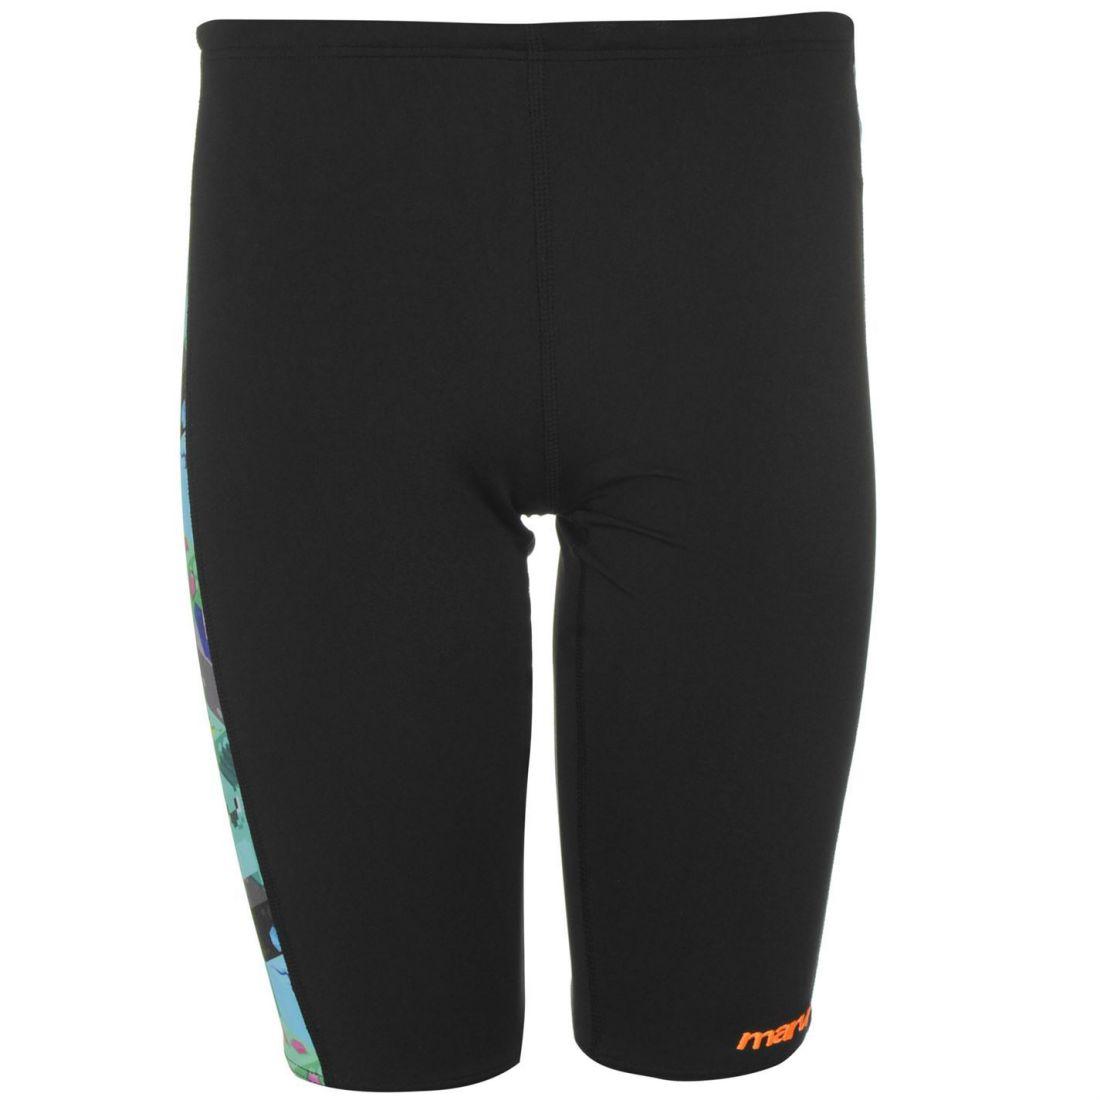 c2215a7766f5e Maru Kids Pacer Jammers Junior Boys Trunk Shorts Training Sports Swimwear